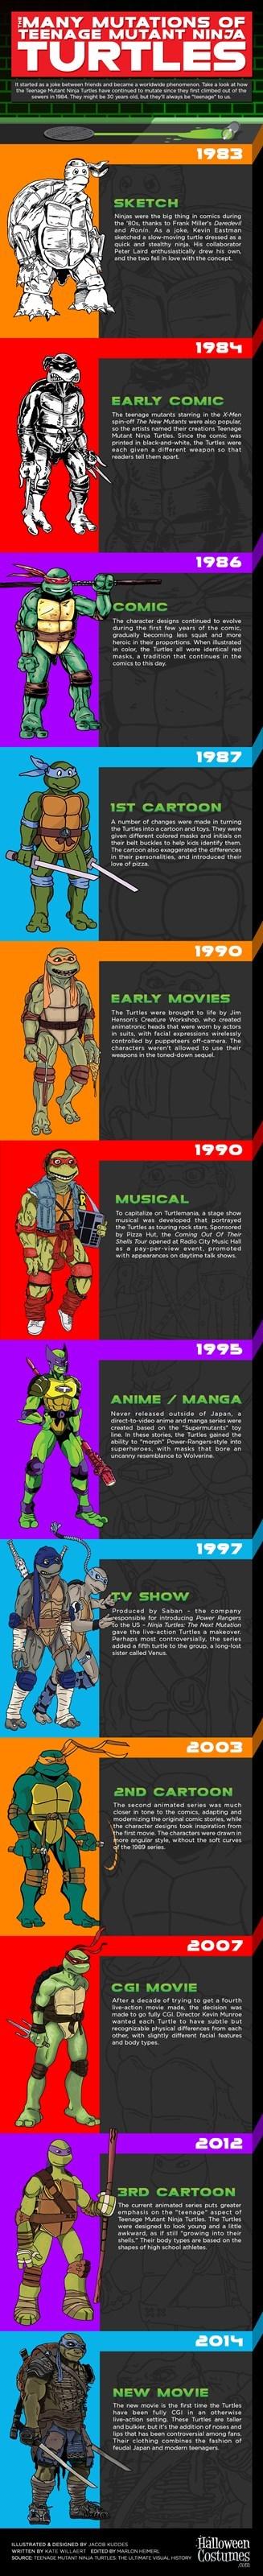 history TMNT infographic - 8272945408